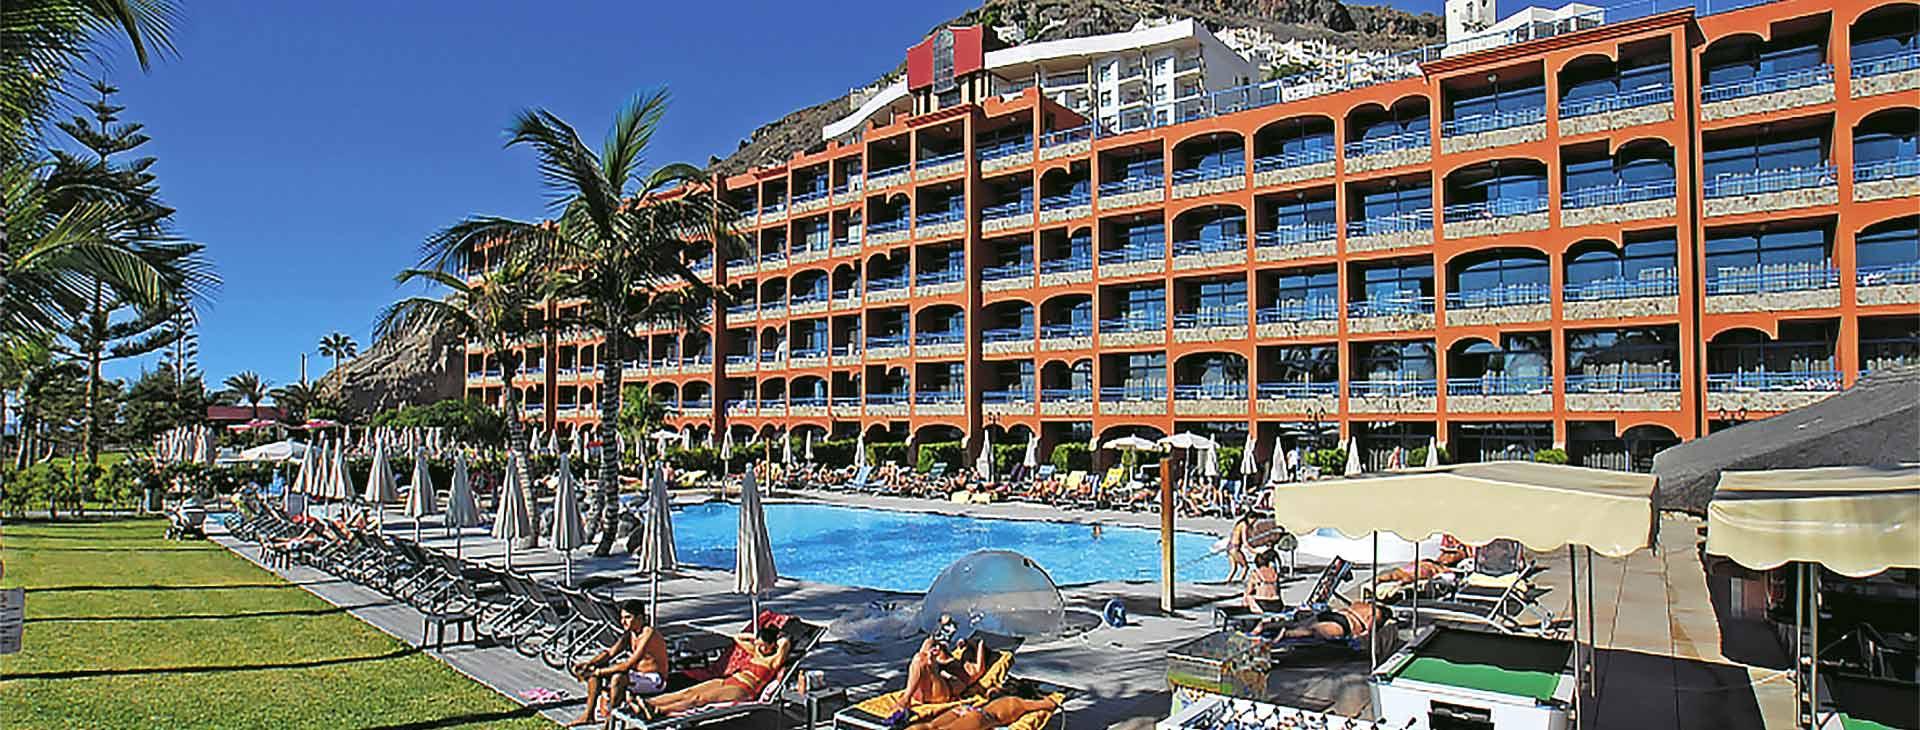 Labranda Riviera Marina Hiszpania, Gran Canaria, Playa del Cura